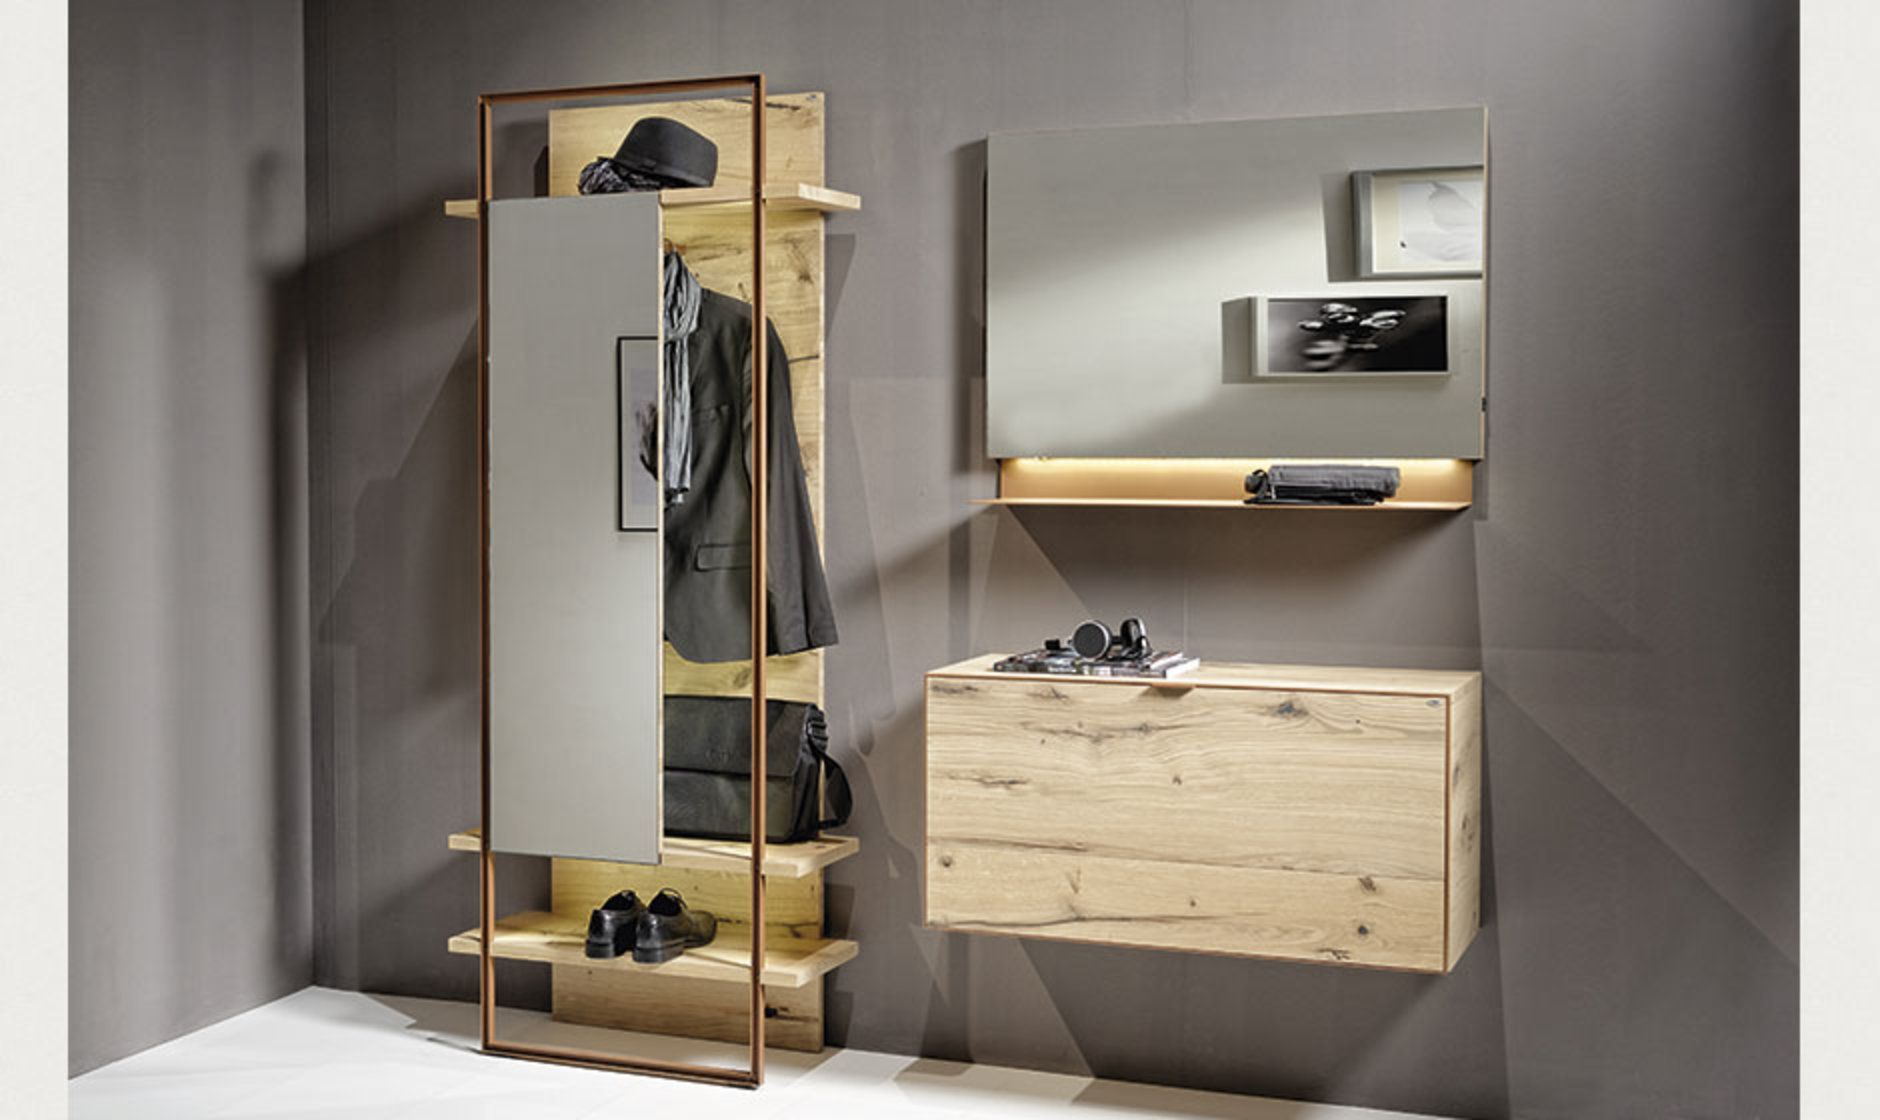 v-cube - produkte - möbel - voglauer | cube furniture